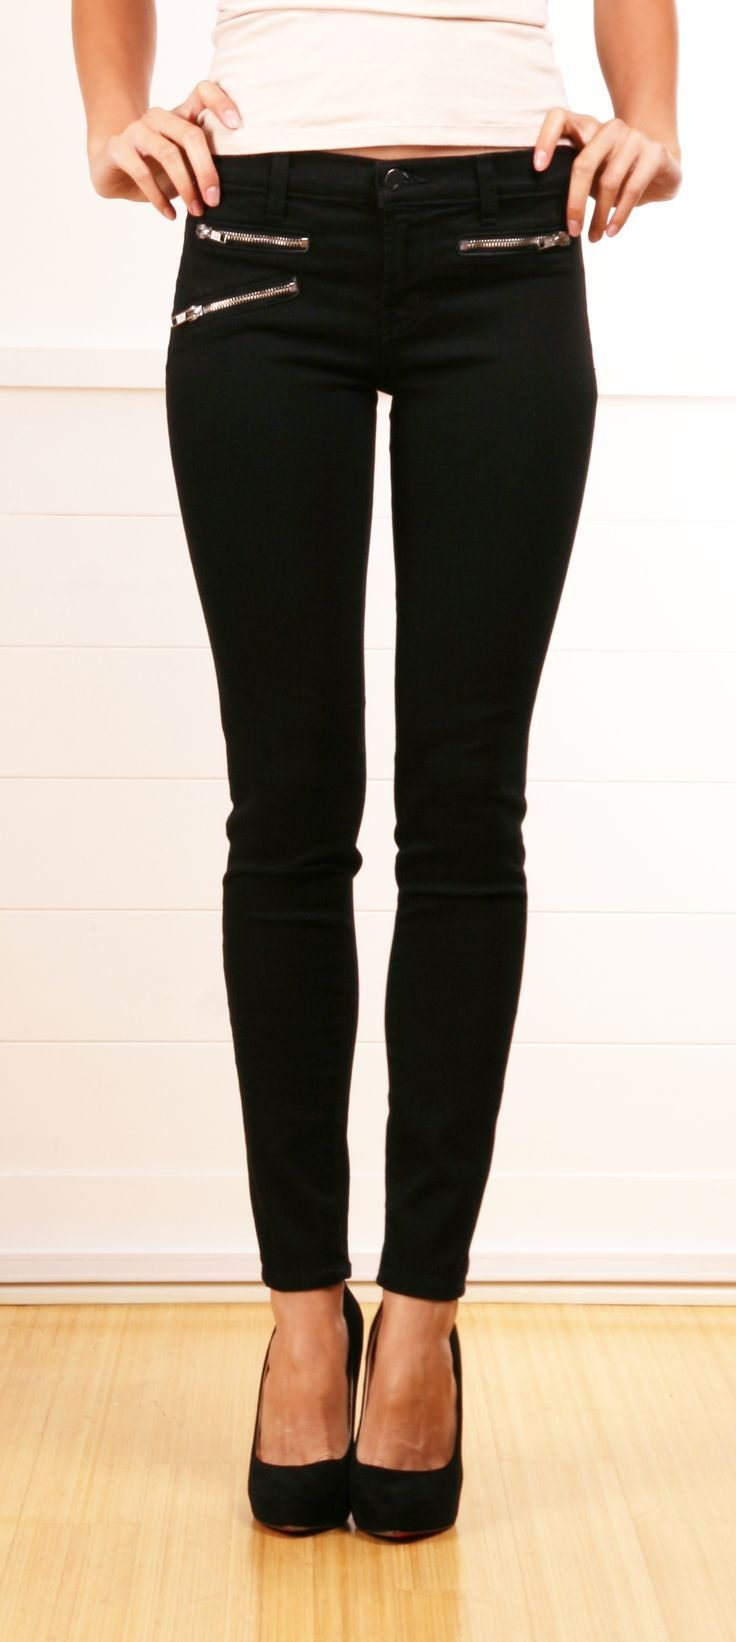 Black dress jeans - J Brand One Of Catherine Middleton S Preferred Jeans Zipper Is